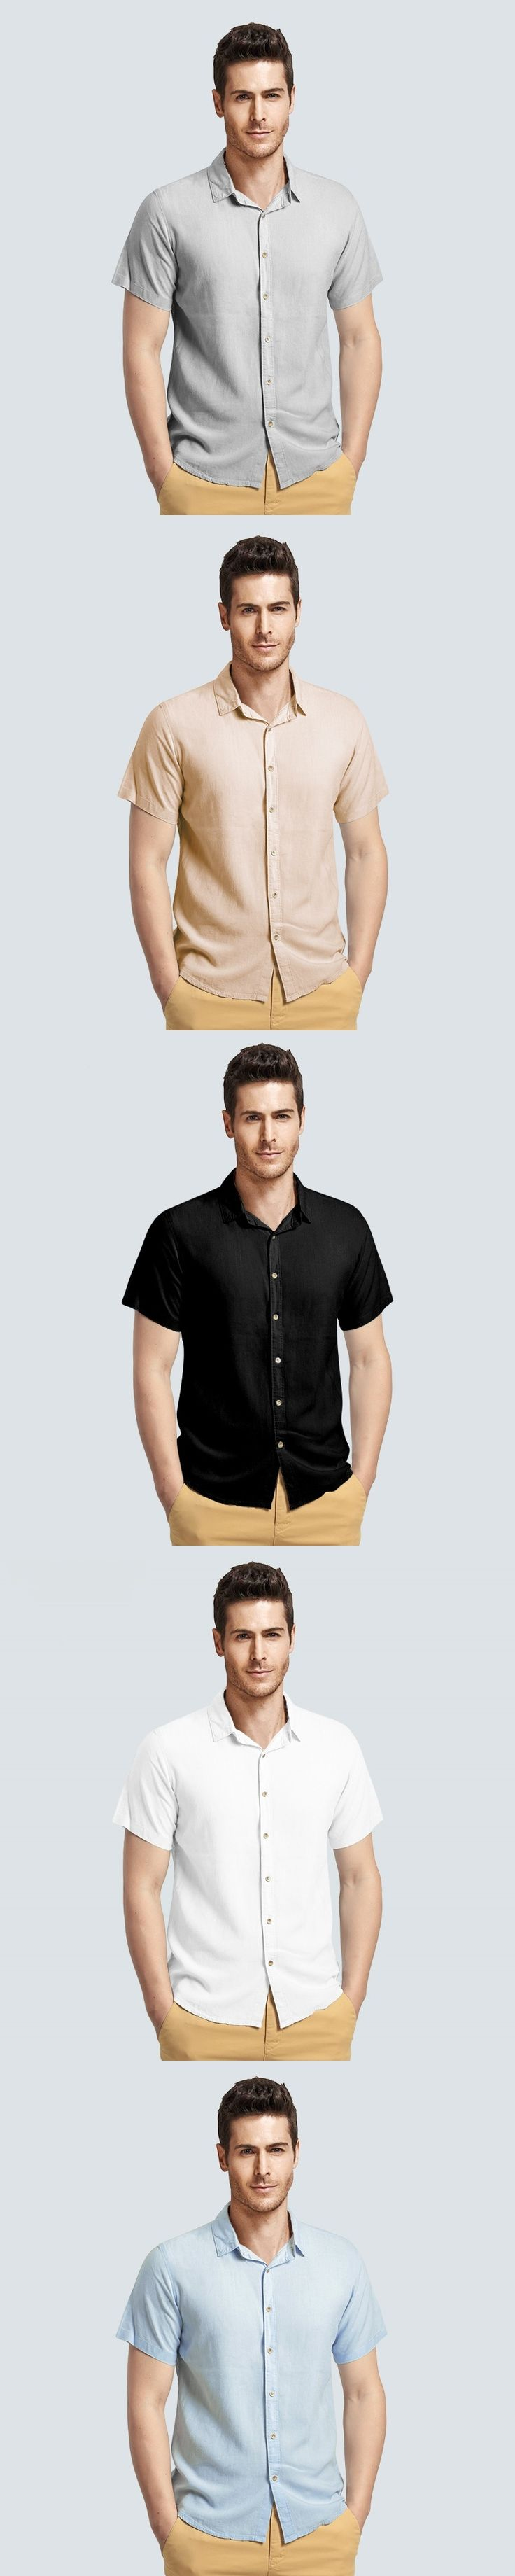 Men's Linen Shirt Mens cotton casual shirt slim